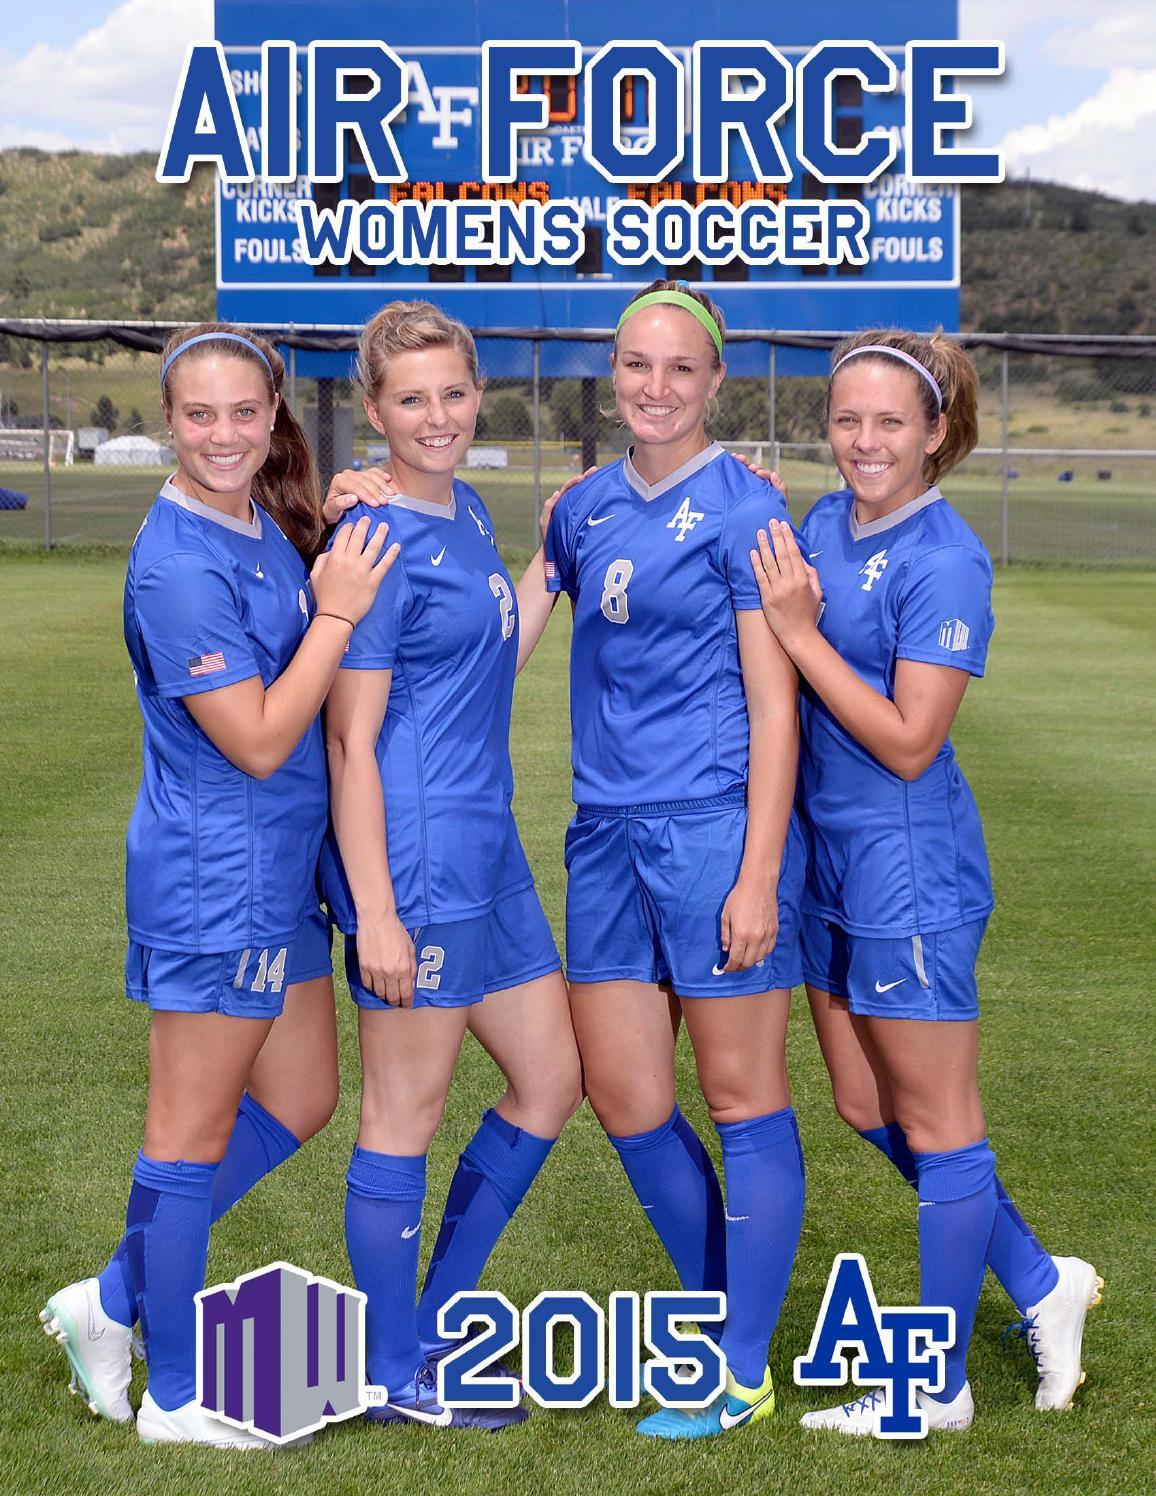 2015 Air Force Women s Soccer Media Guide by Nick Arseniak - issuu 721278ed4